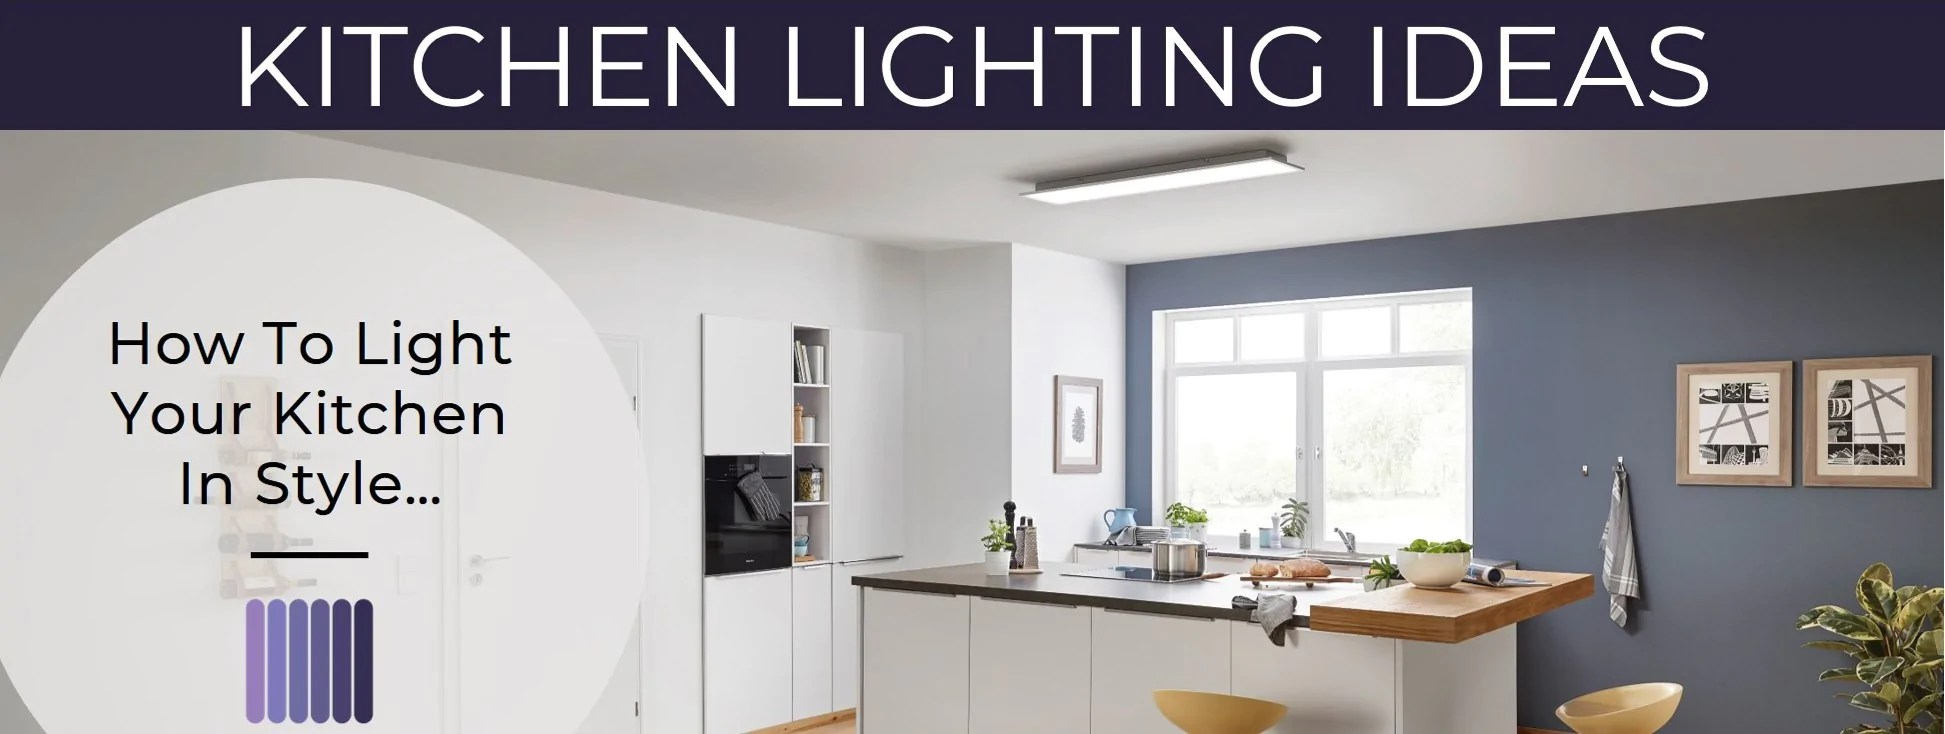 kitchen lighting ideas how to light